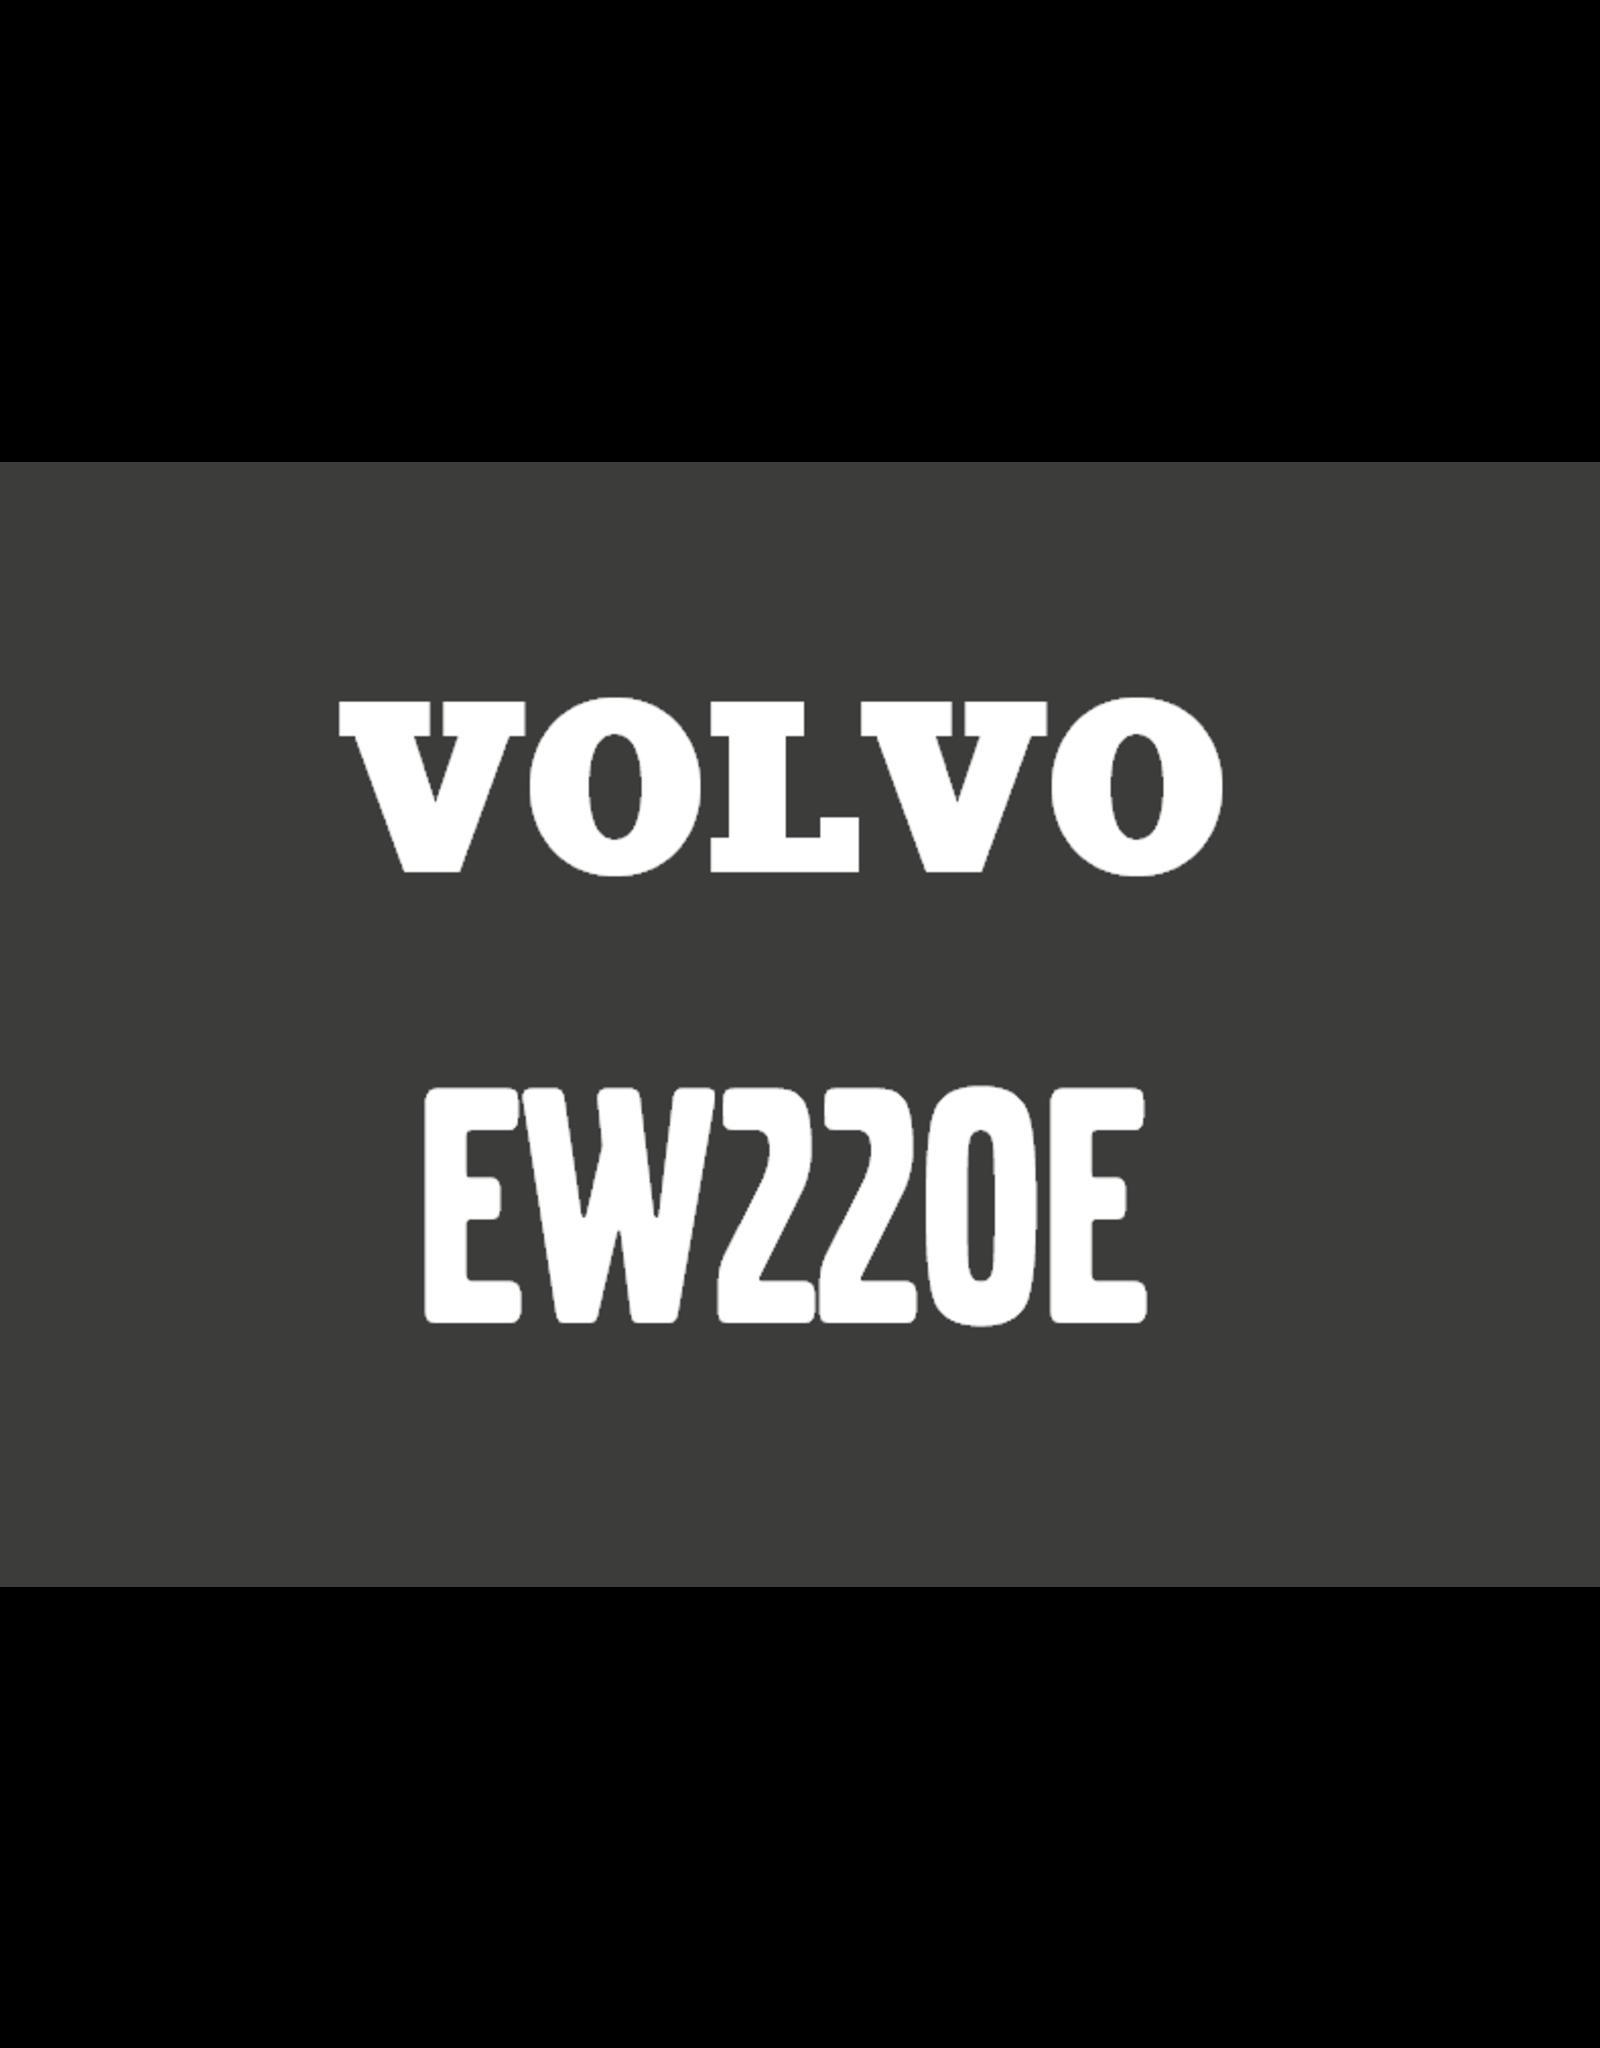 Echle Hartstahl GmbH FOPS for Volvo EW220E